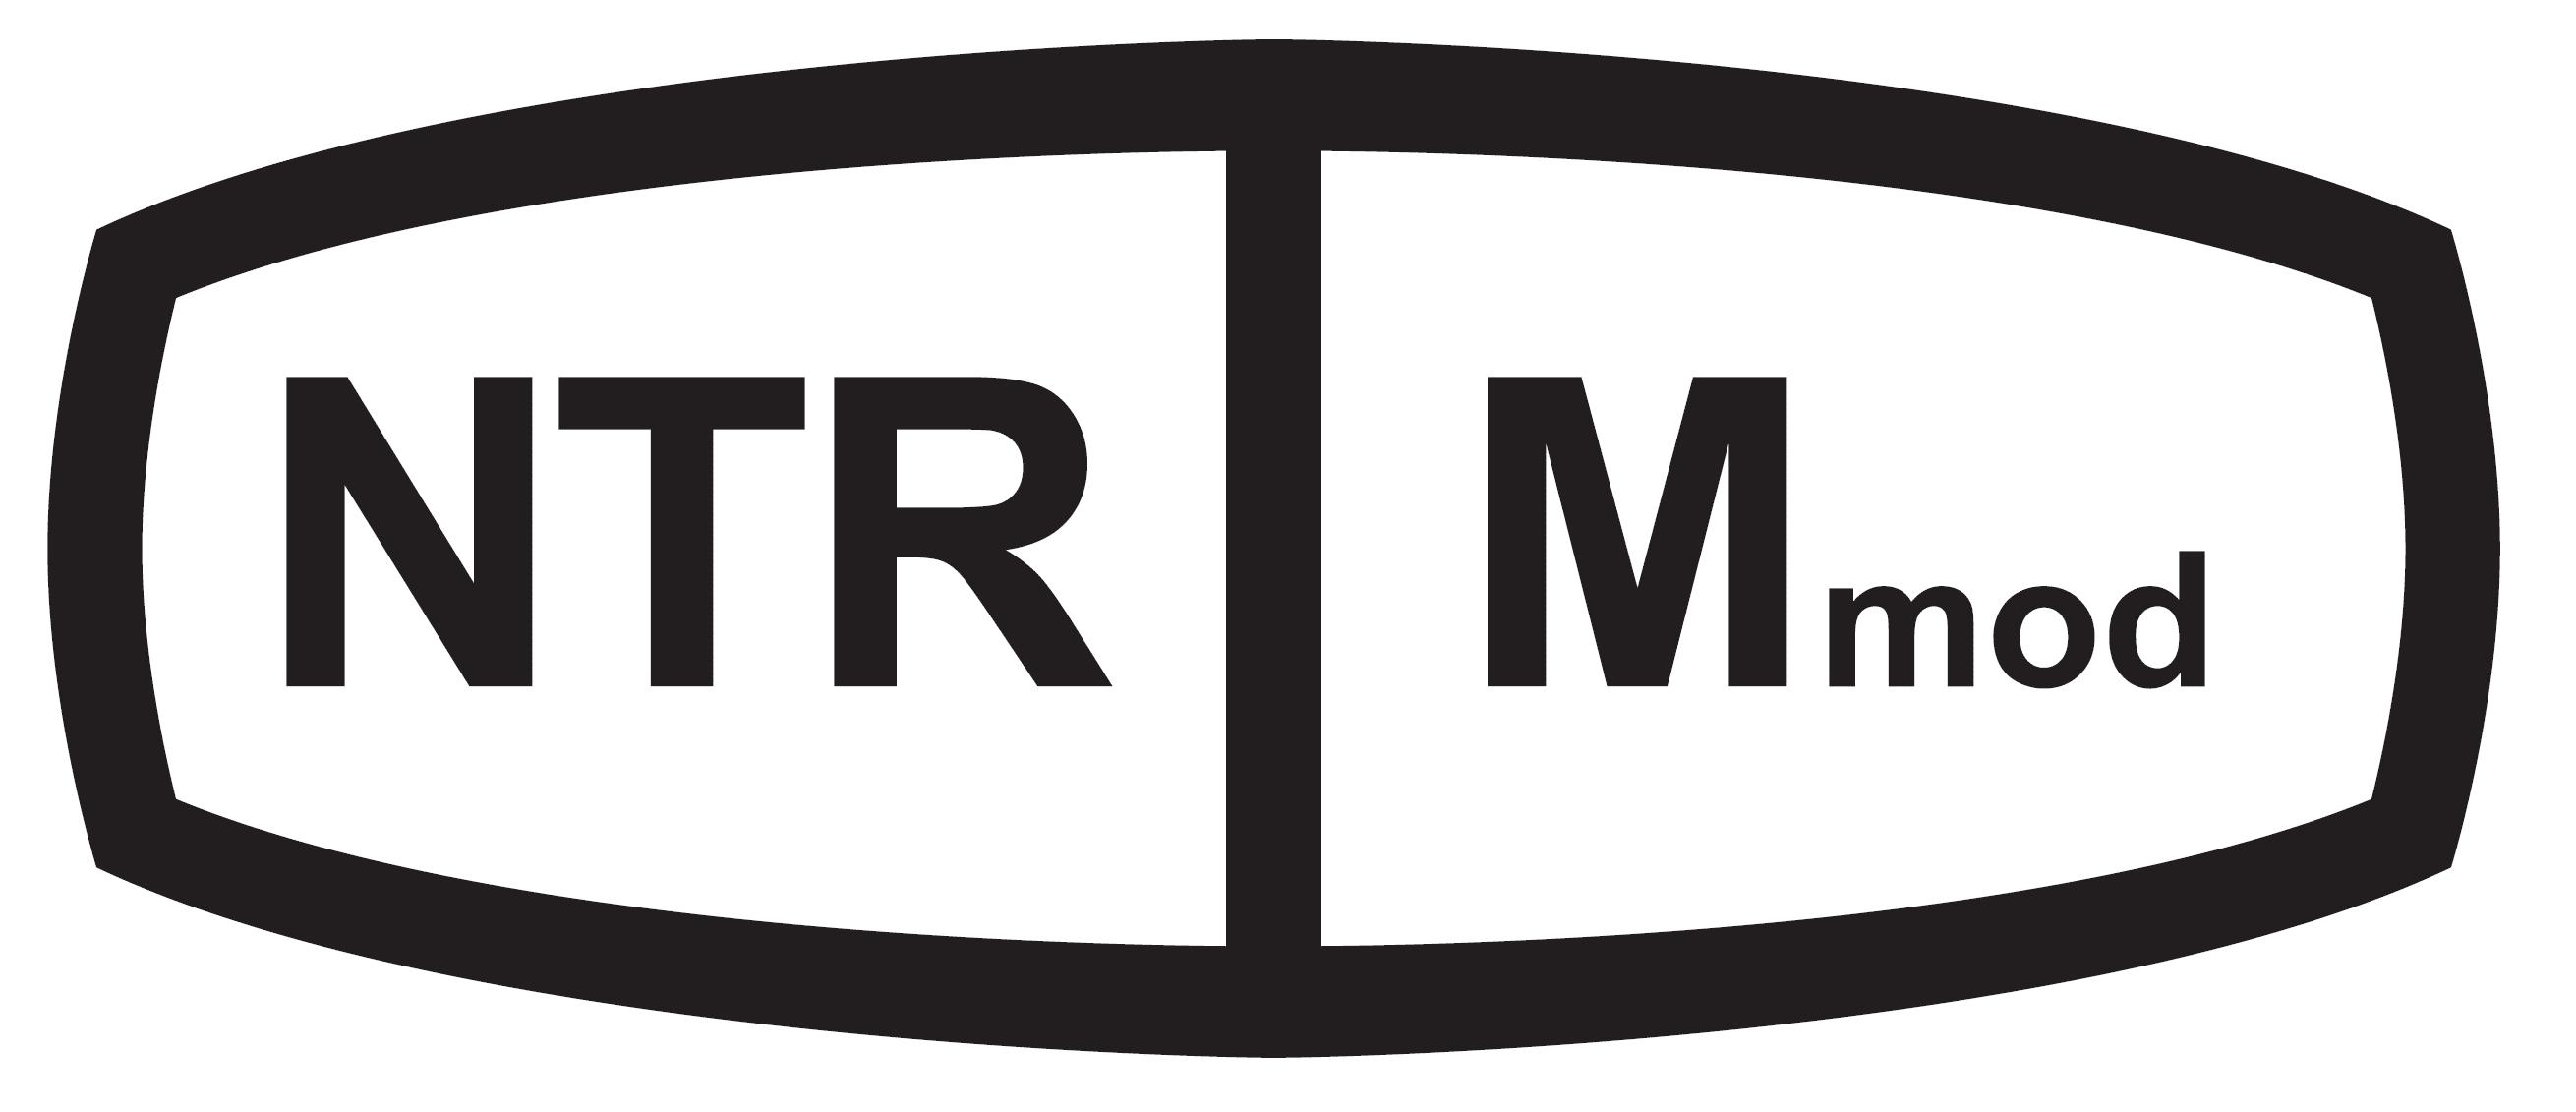 Träskyddsklass NTR M mod